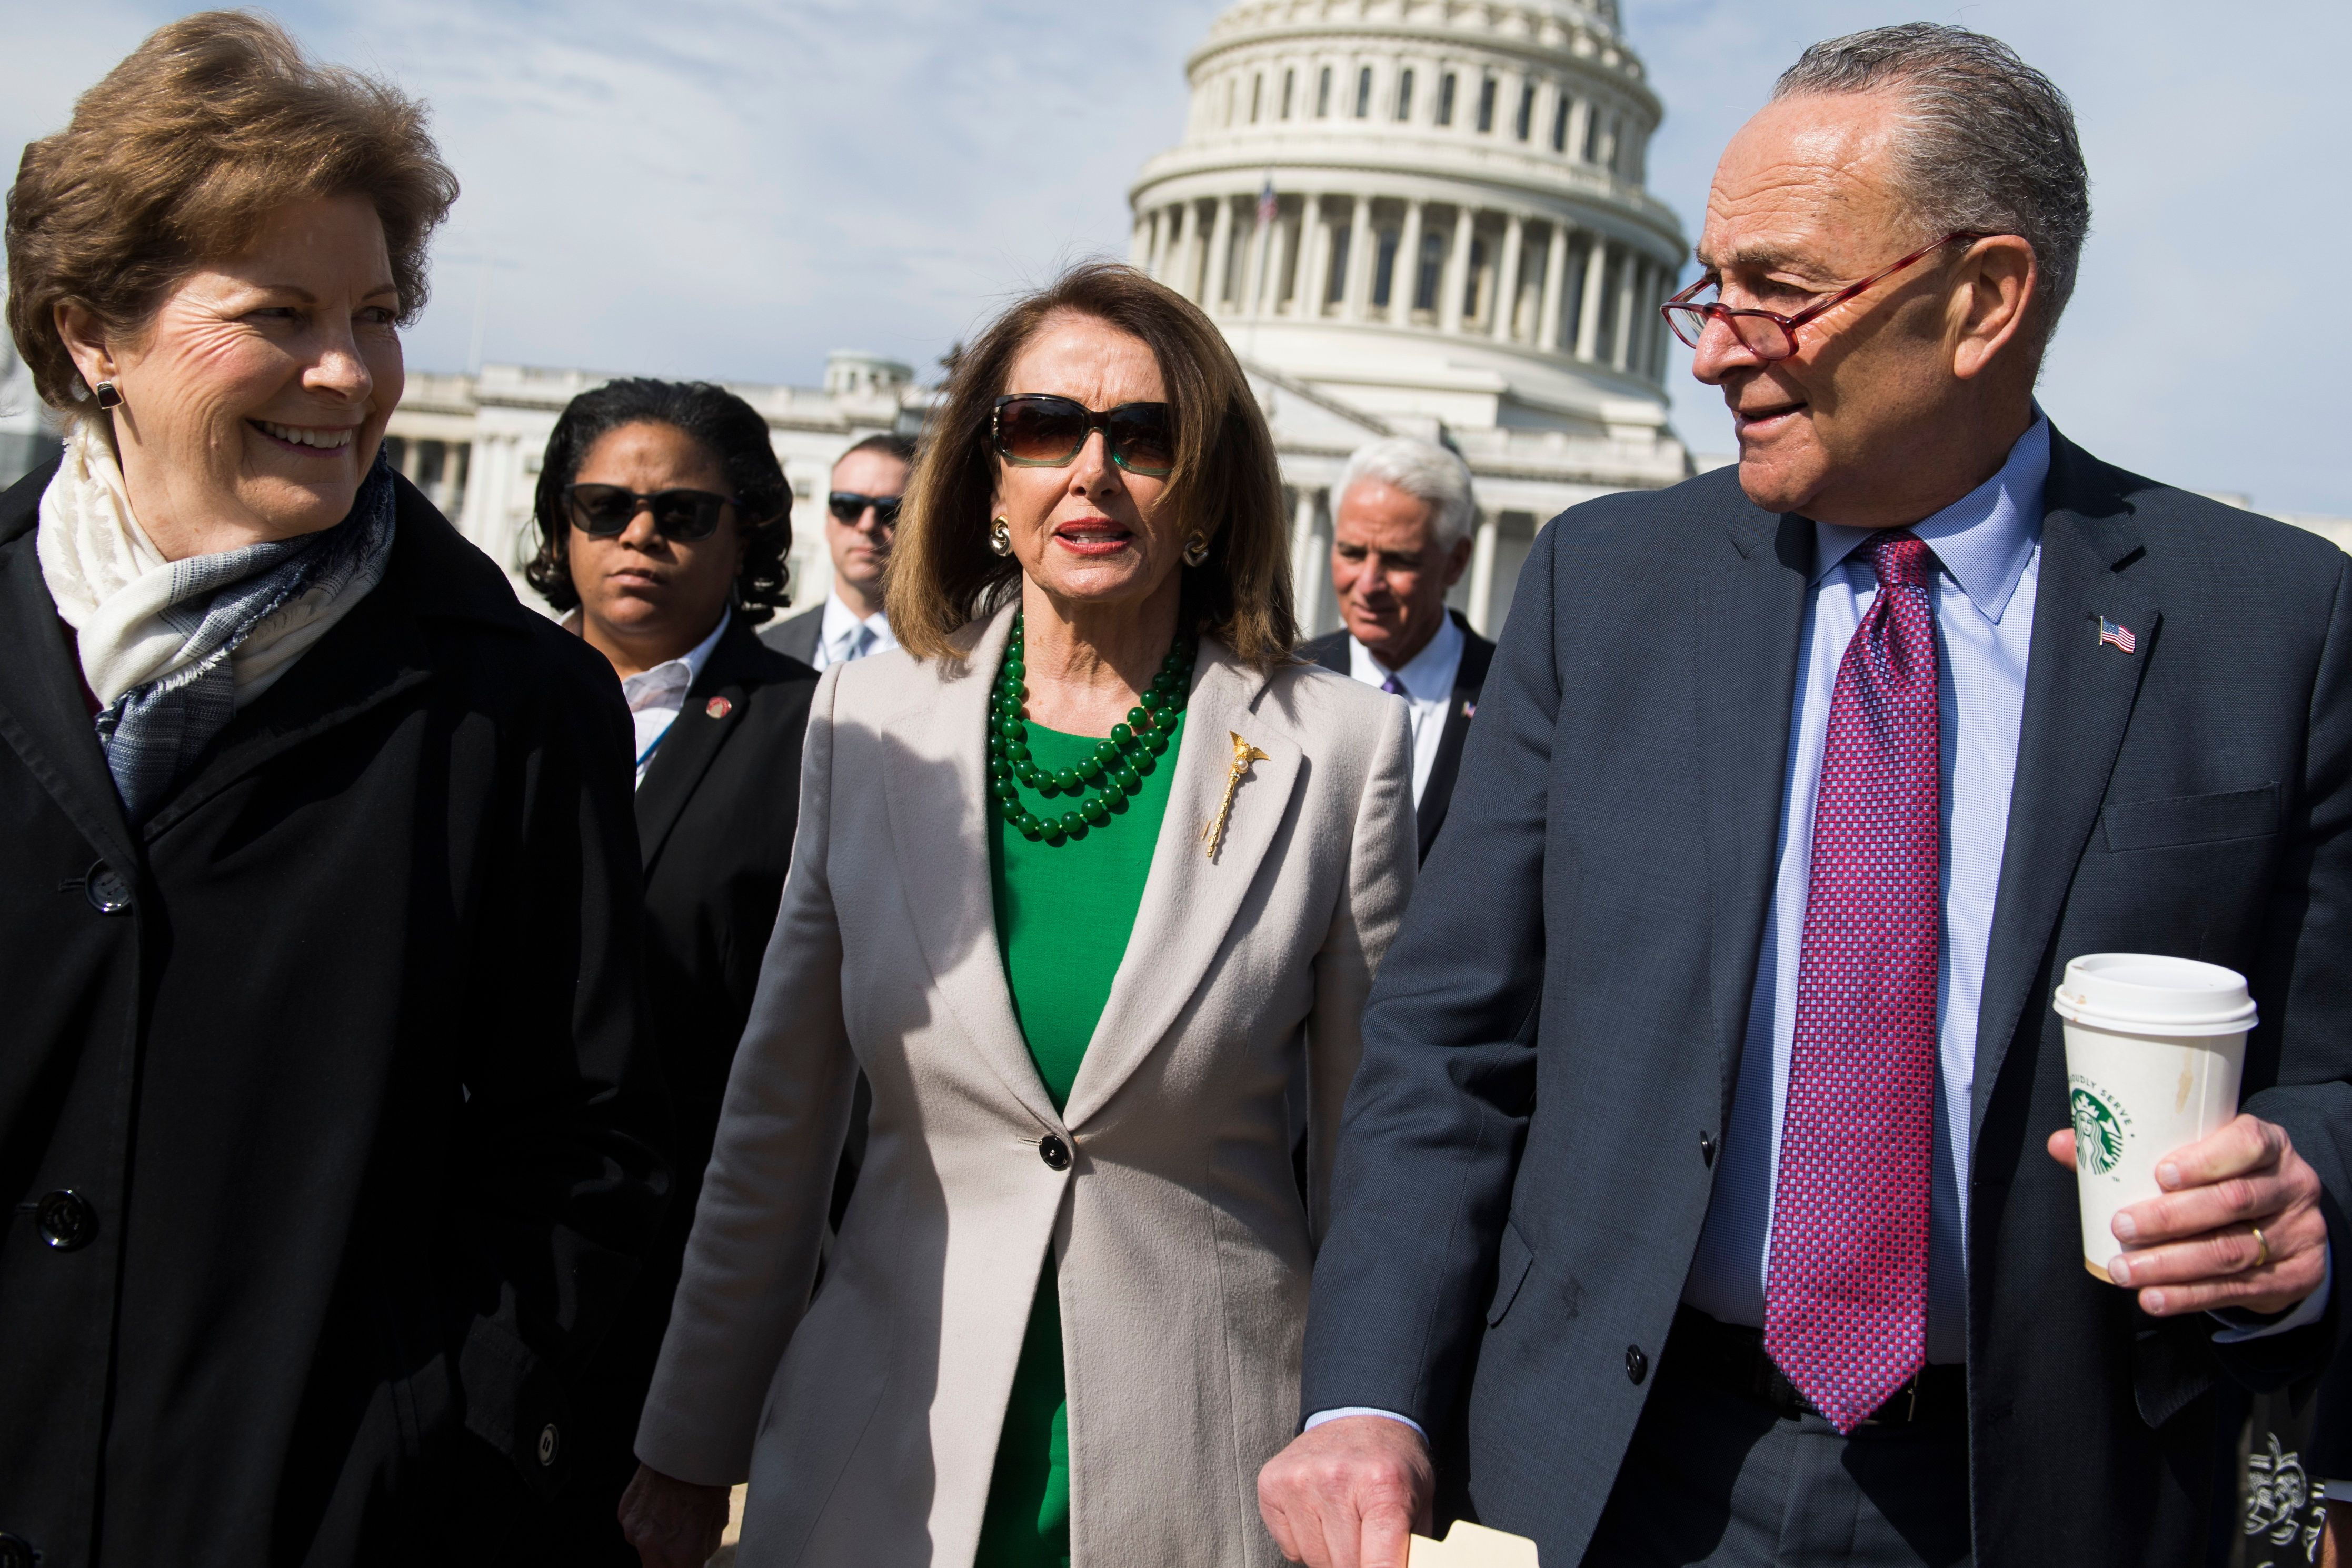 House Speaker Nancy Pelosi and Senate Minority Leader Chuck Schumer are heeding norms of decorum that...